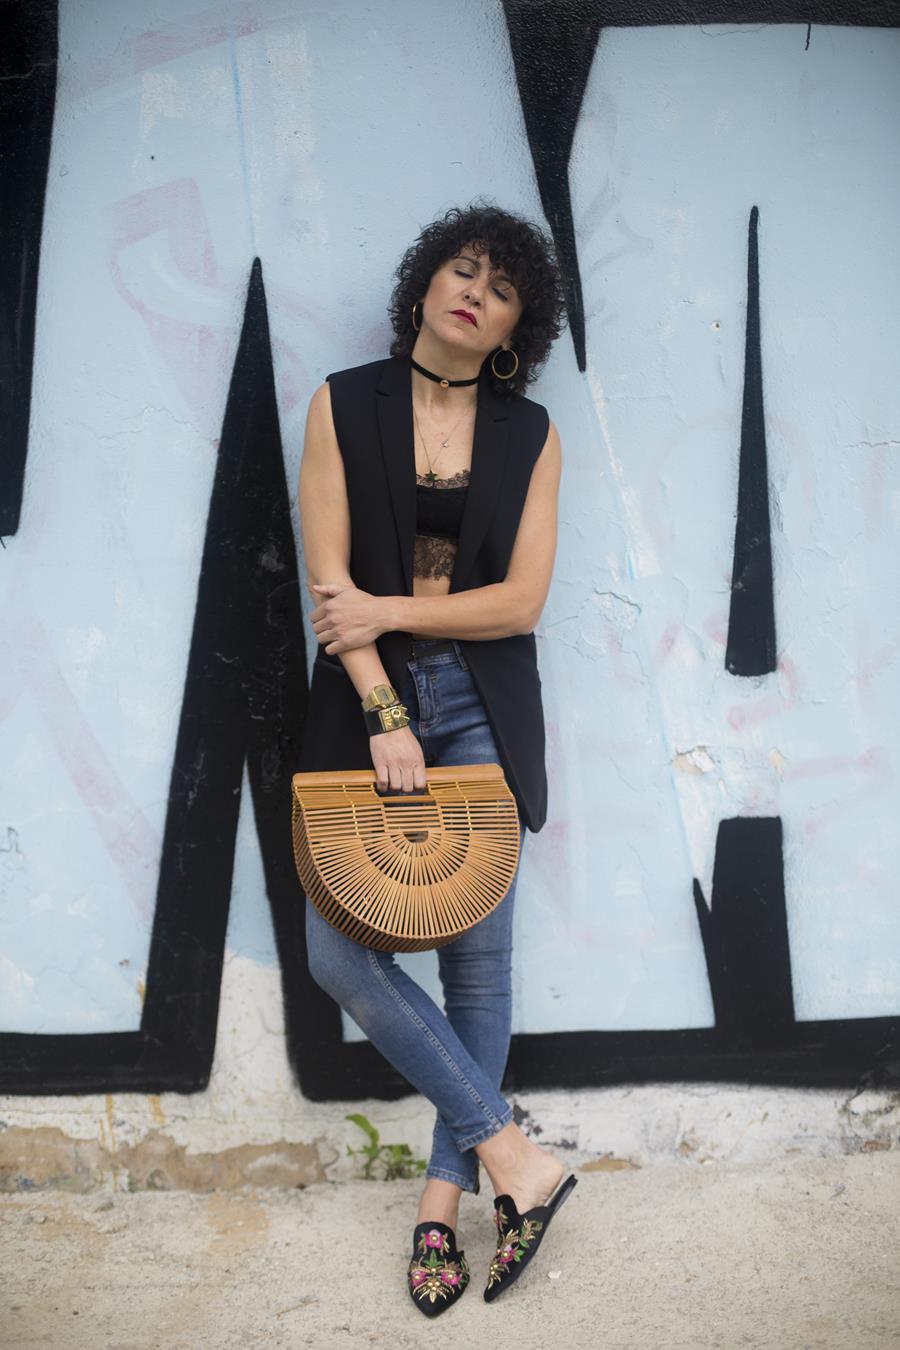 Rebeca Valdivia, asesora de imagen, personal shopper, estilista, stilist, Donostia, San Sebastián, Miss Clov, no es no, chaleco blazer, vest, top, guipur, encaje, choker, pendientes aro, earings, bolso, bamboo, cesta bambú, moules, jeans, skinny, super skinny, curls, rizos, graffiti